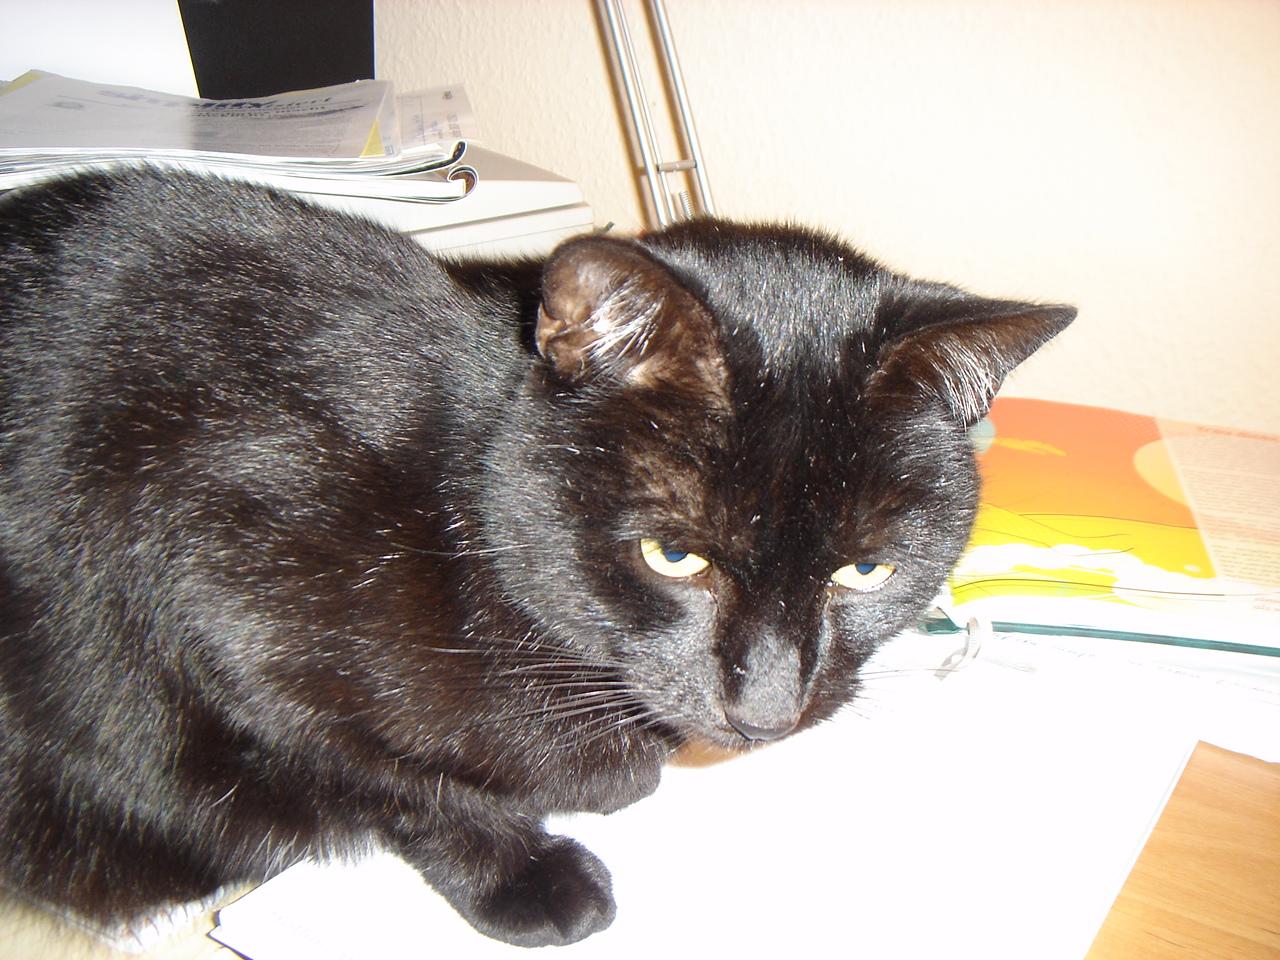 Bürofitness, Büro-Jogging, von Katzen lernen